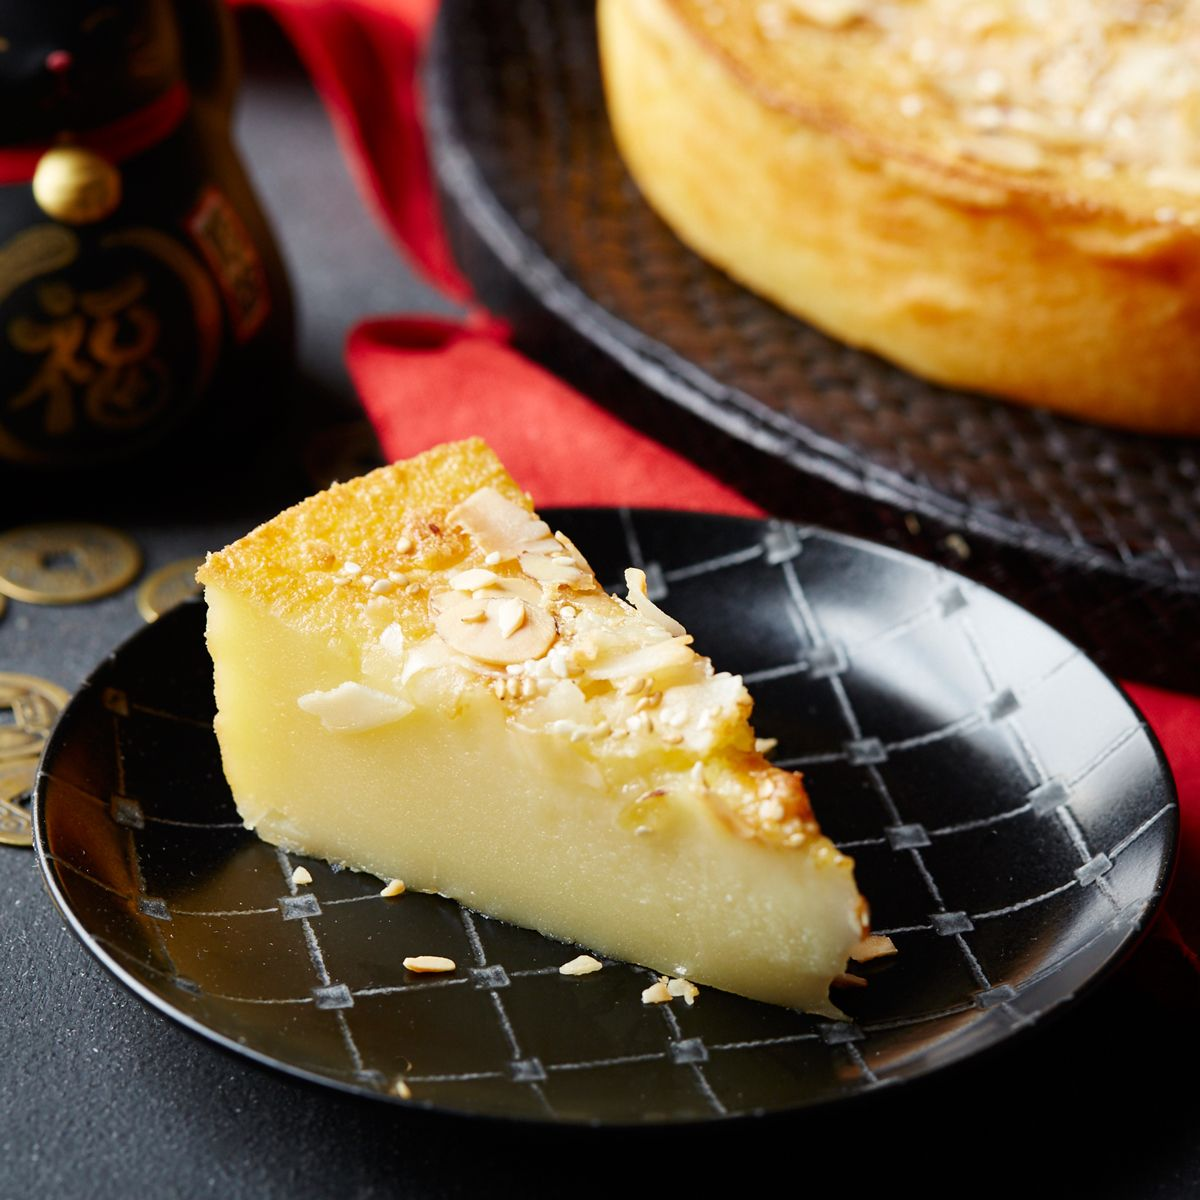 Nian gao recipe nian gao wine and cake dim sum forumfinder Gallery